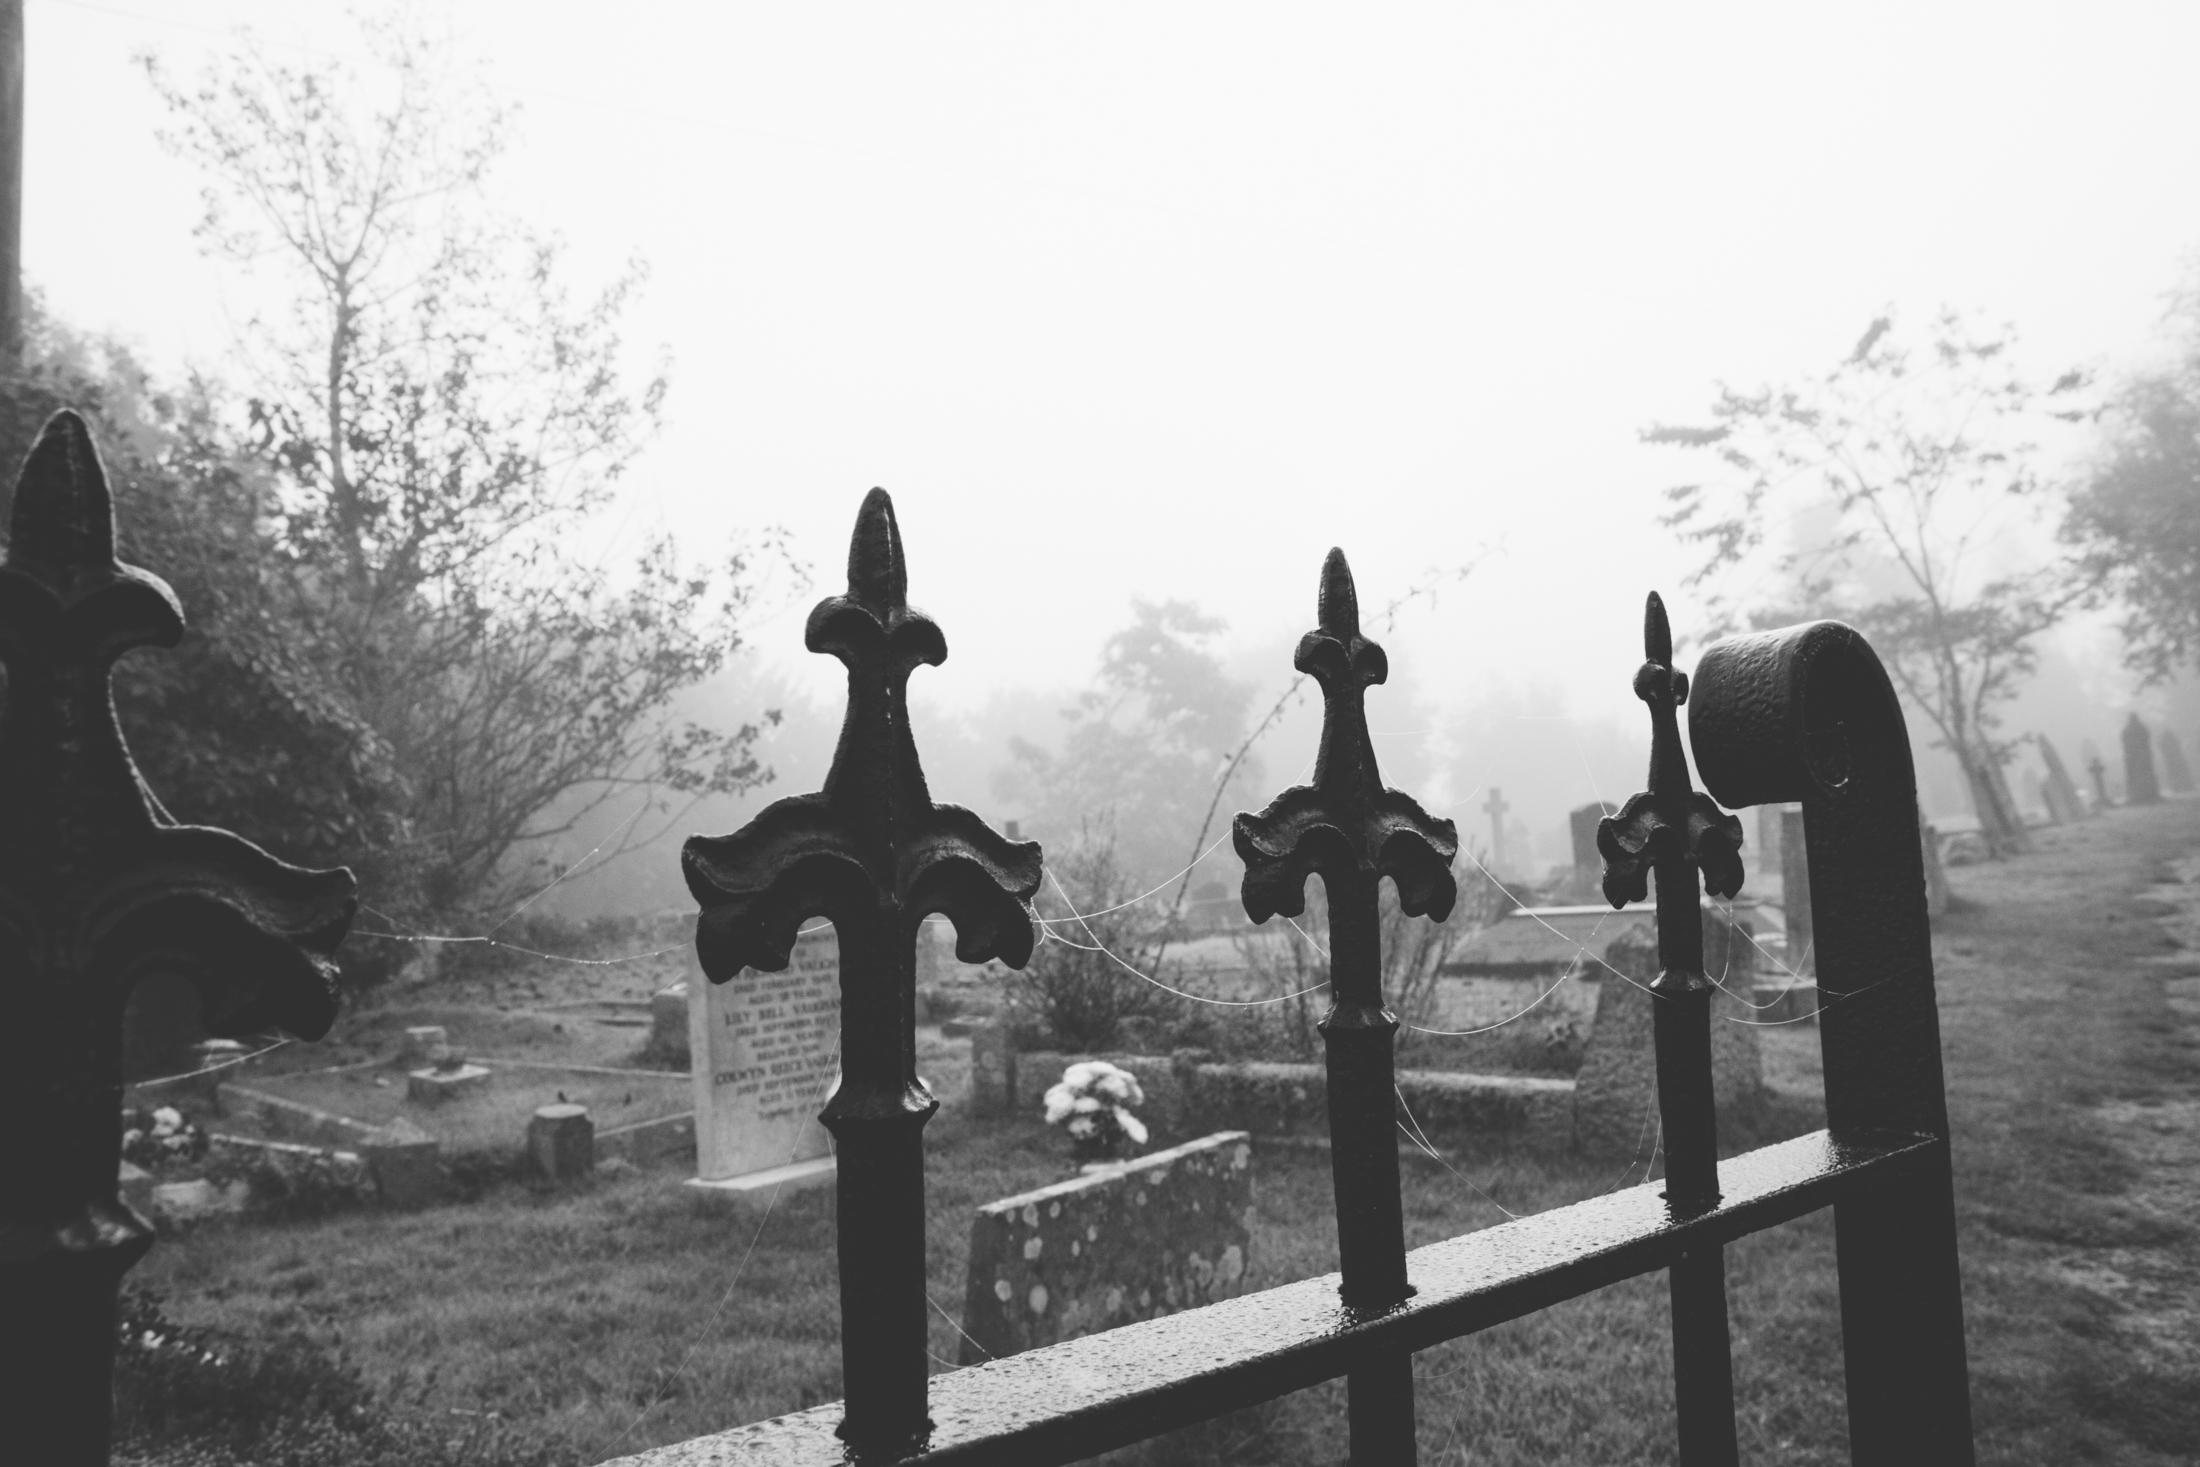 St Briavels castle church graveyard